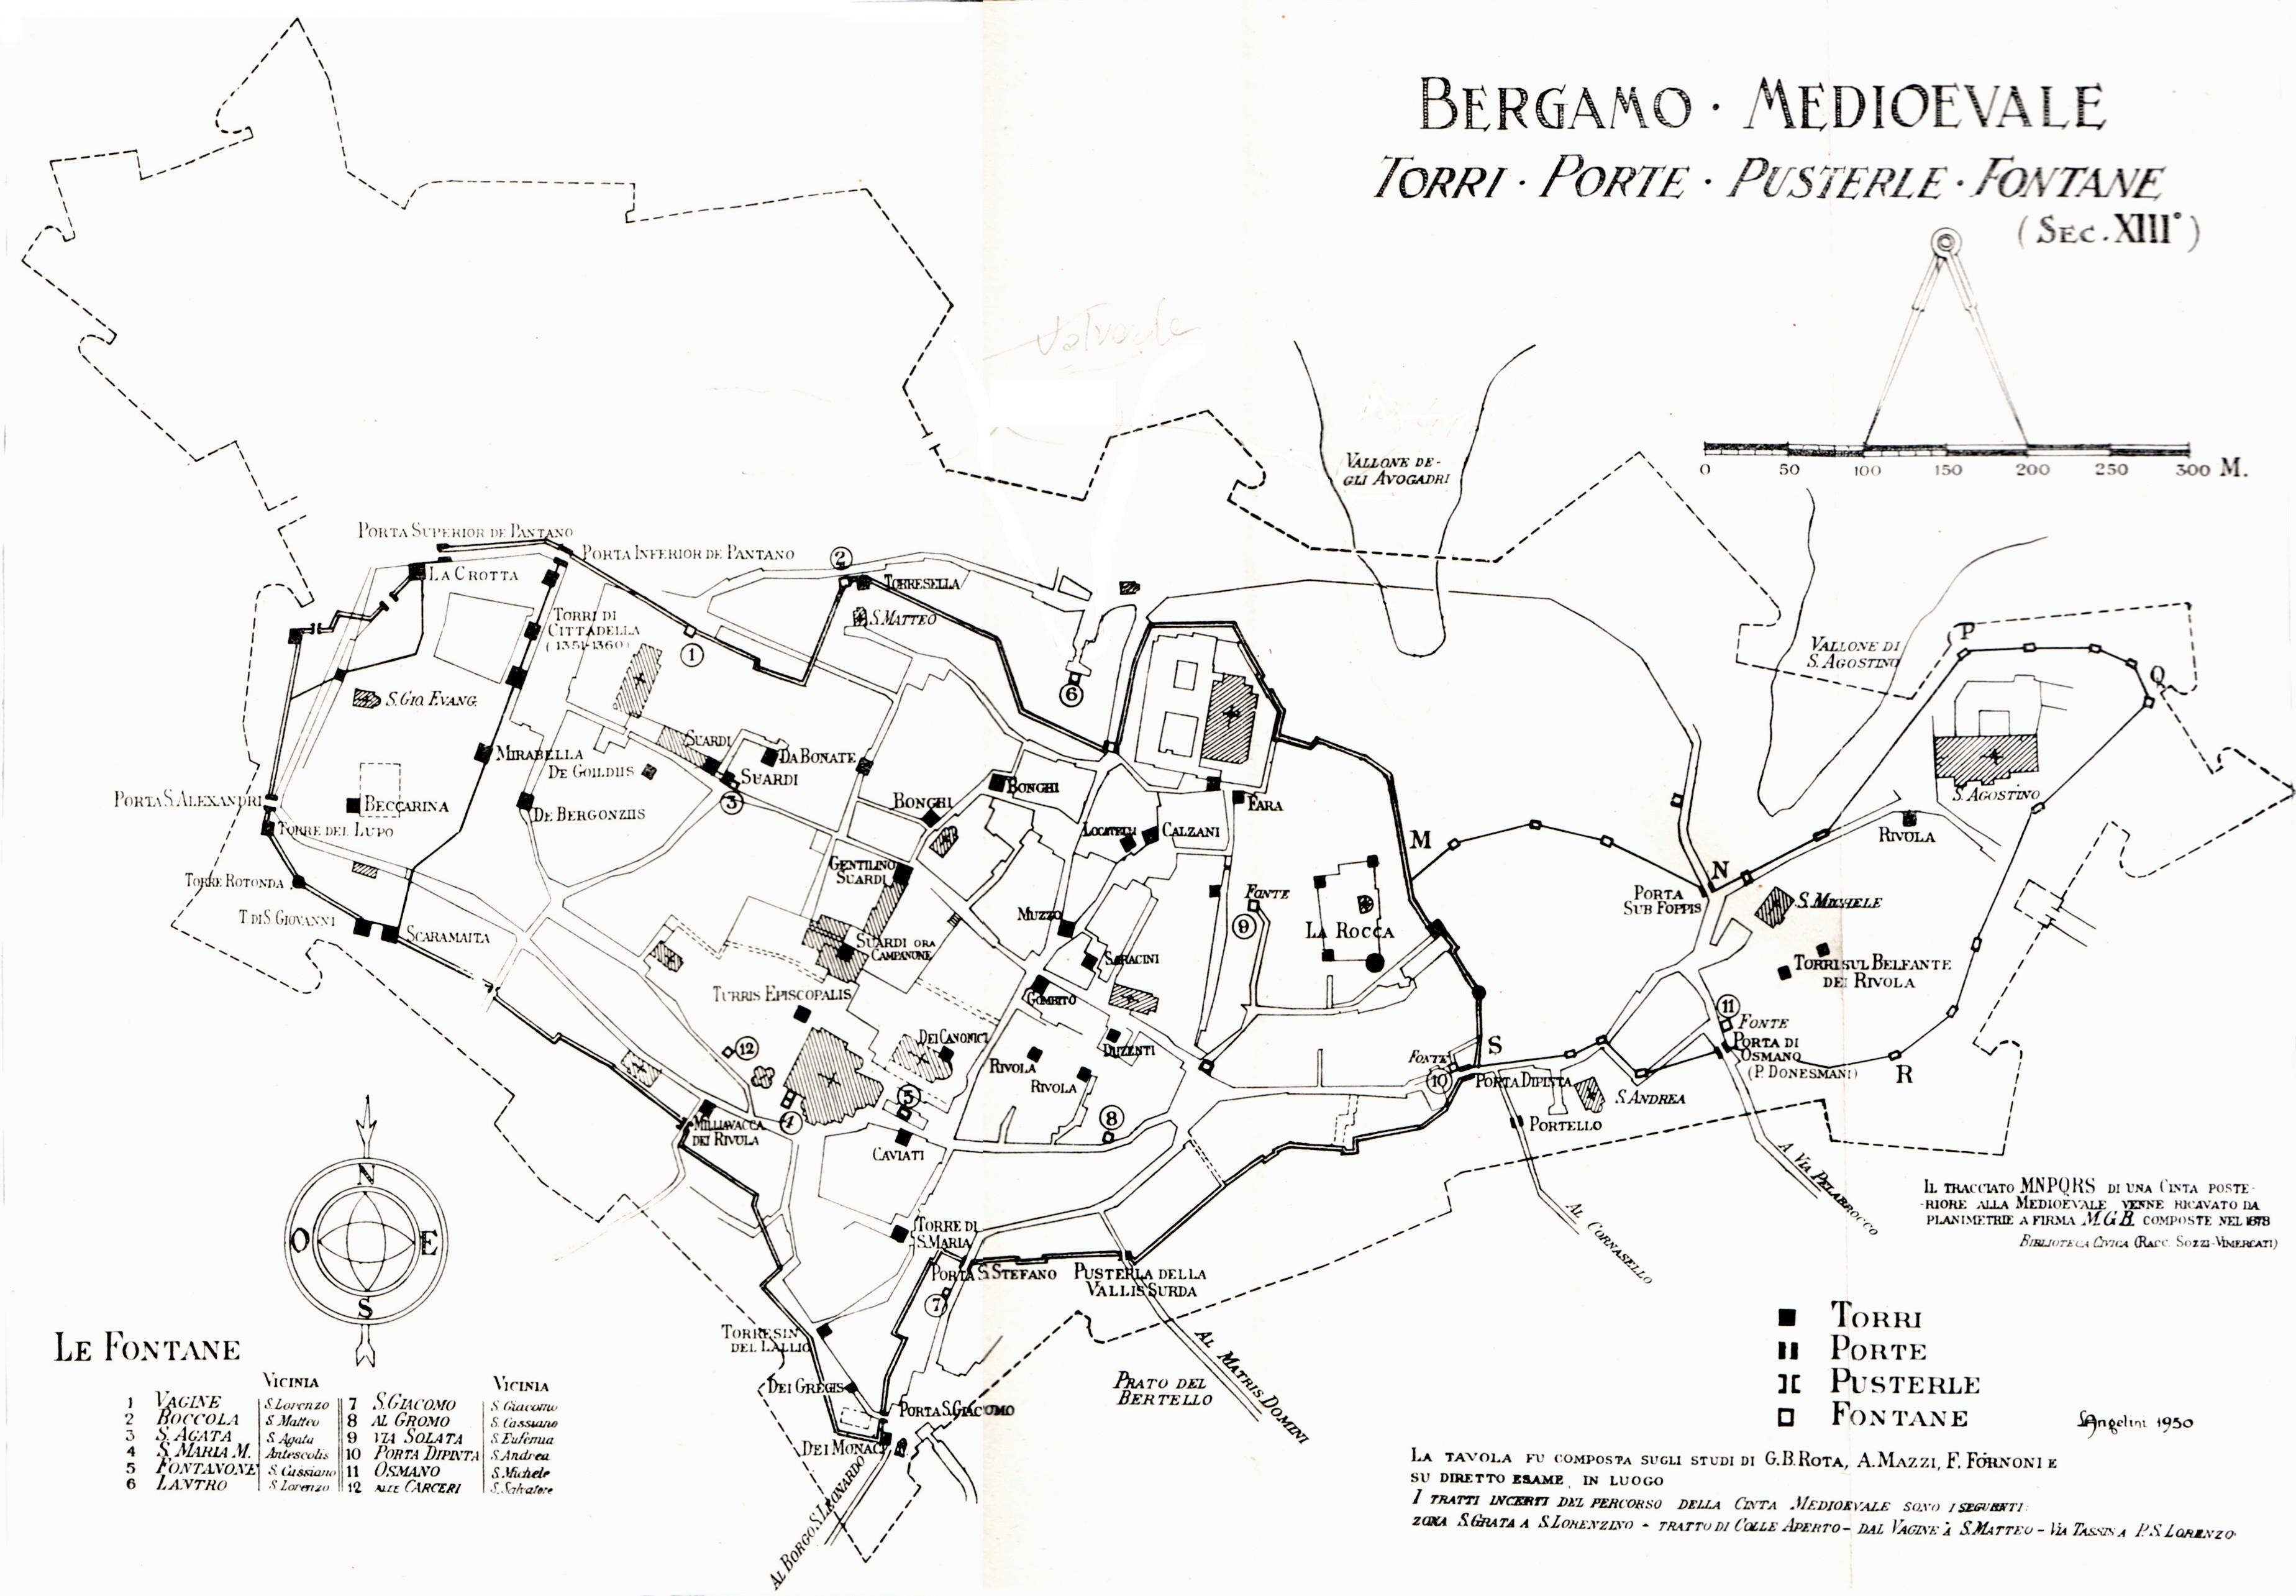 torri, porte, fontane nel medioevo - mappa L.Angelini 1952